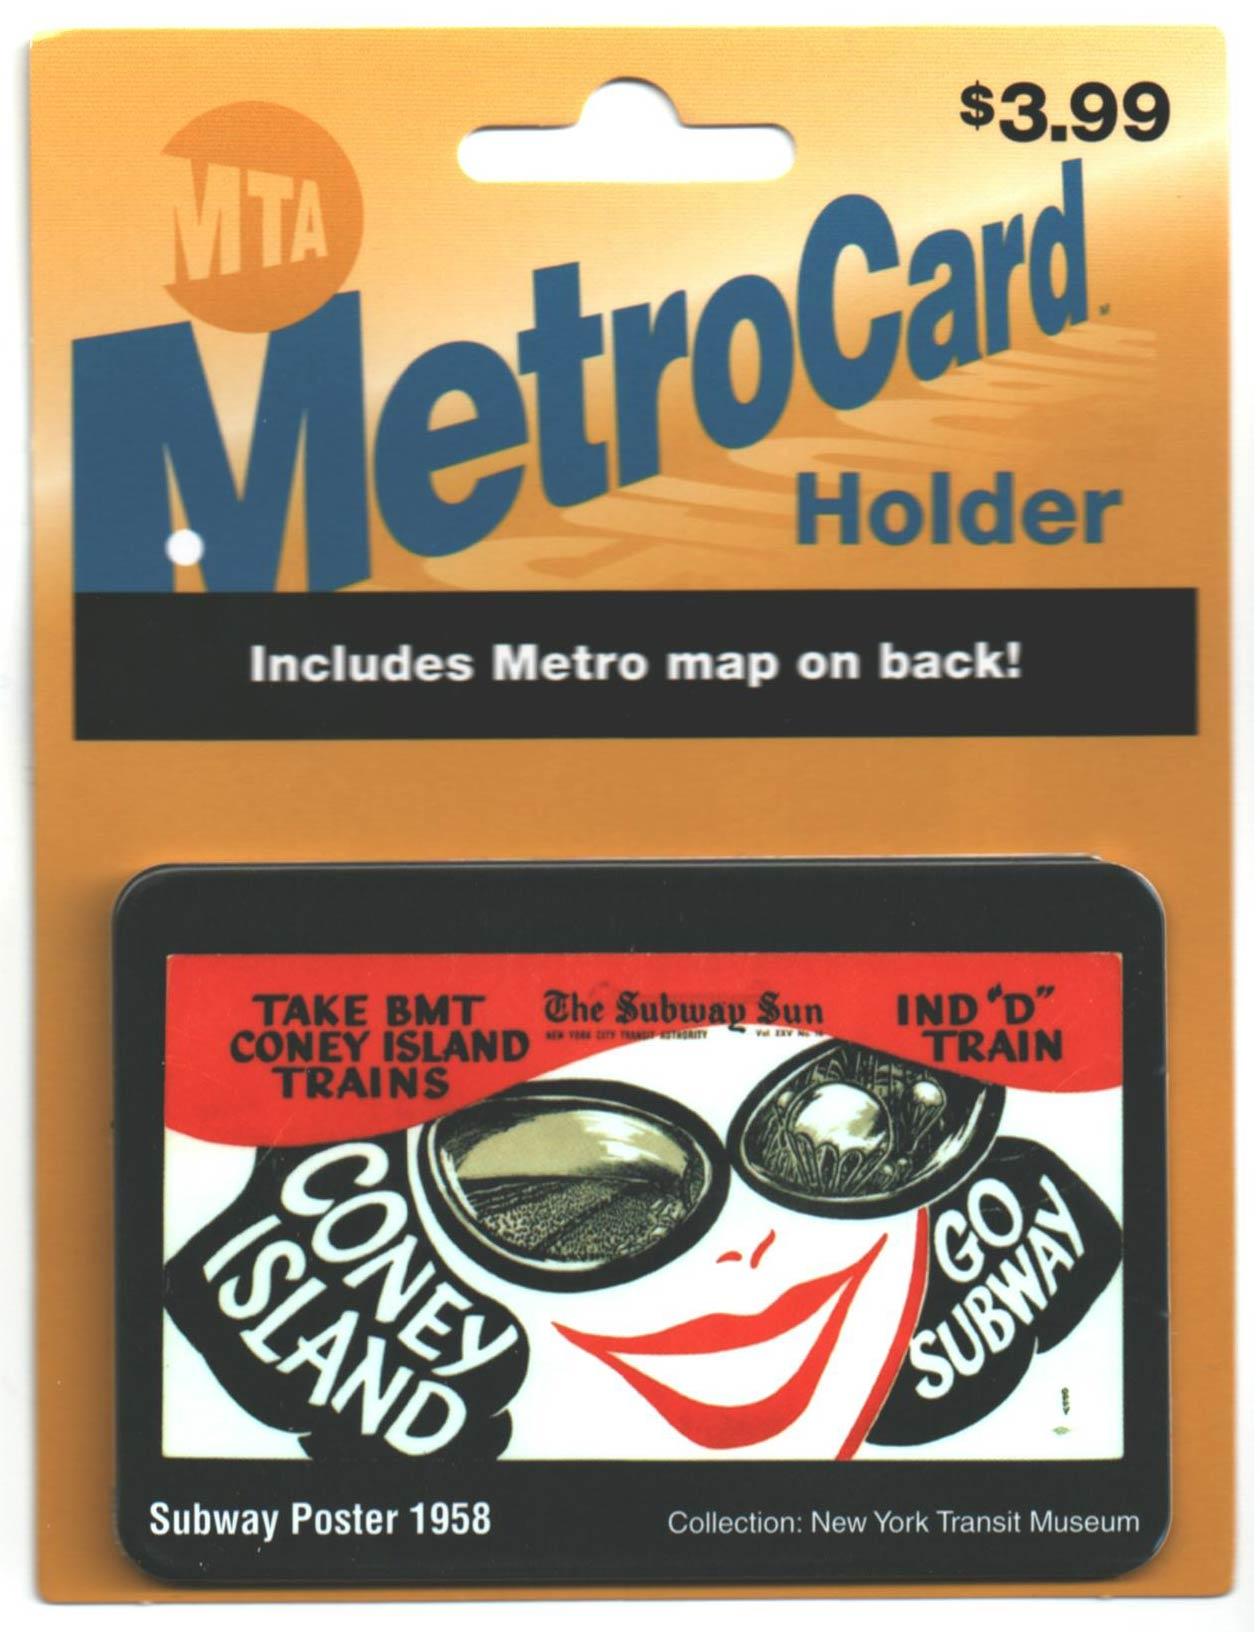 MetroCard Holder Coney Island